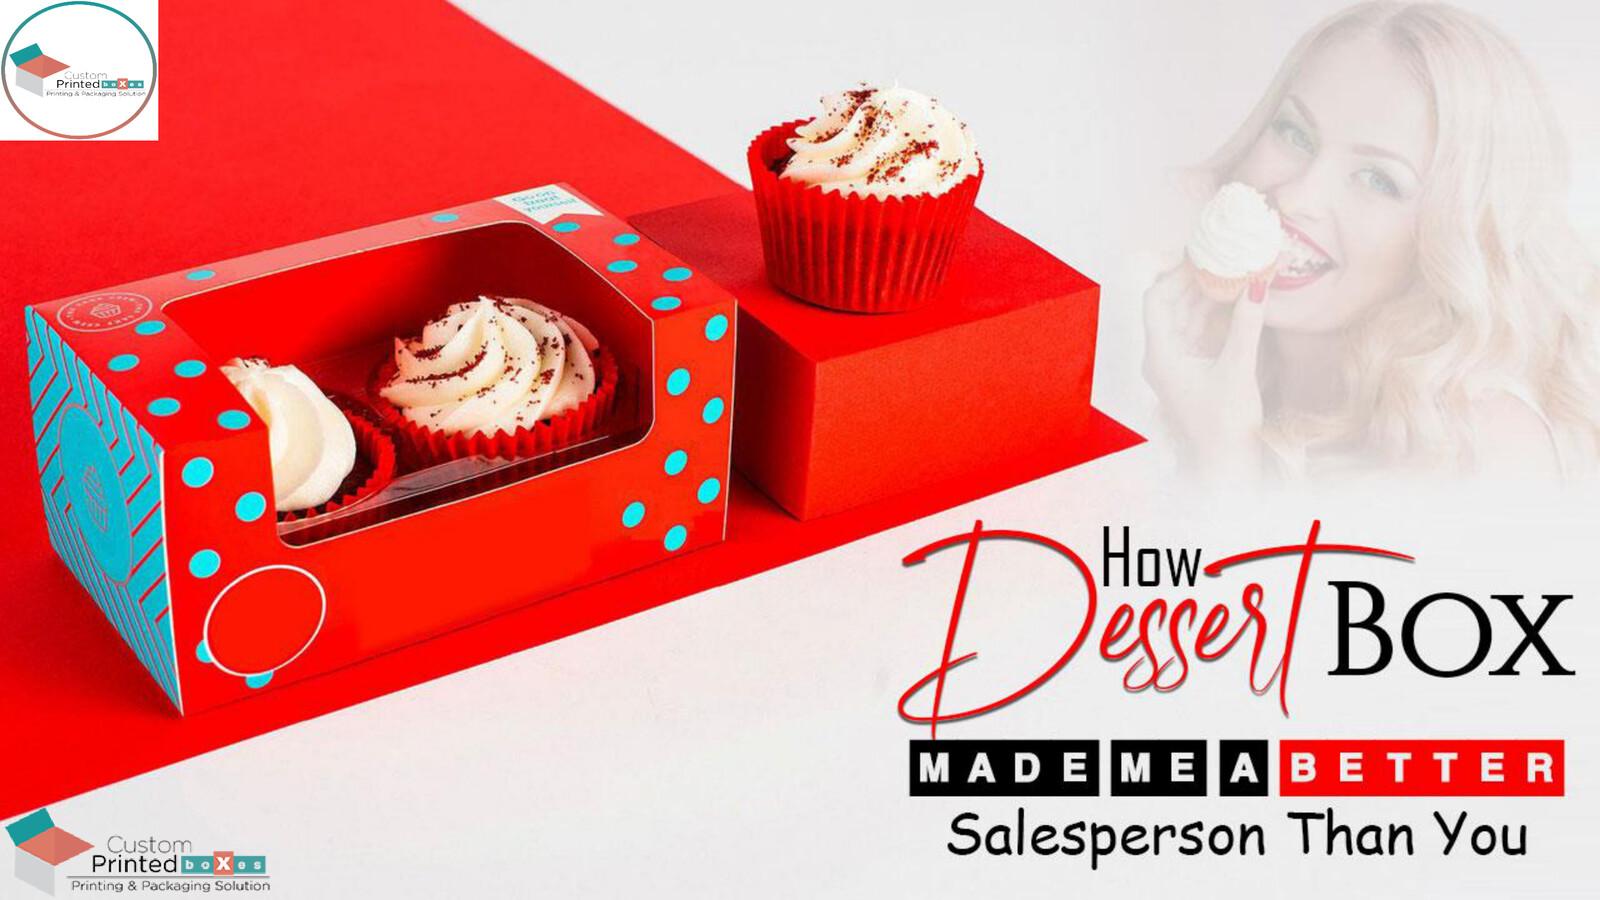 How Dessert Box Made Me A Better Salesperson Than You